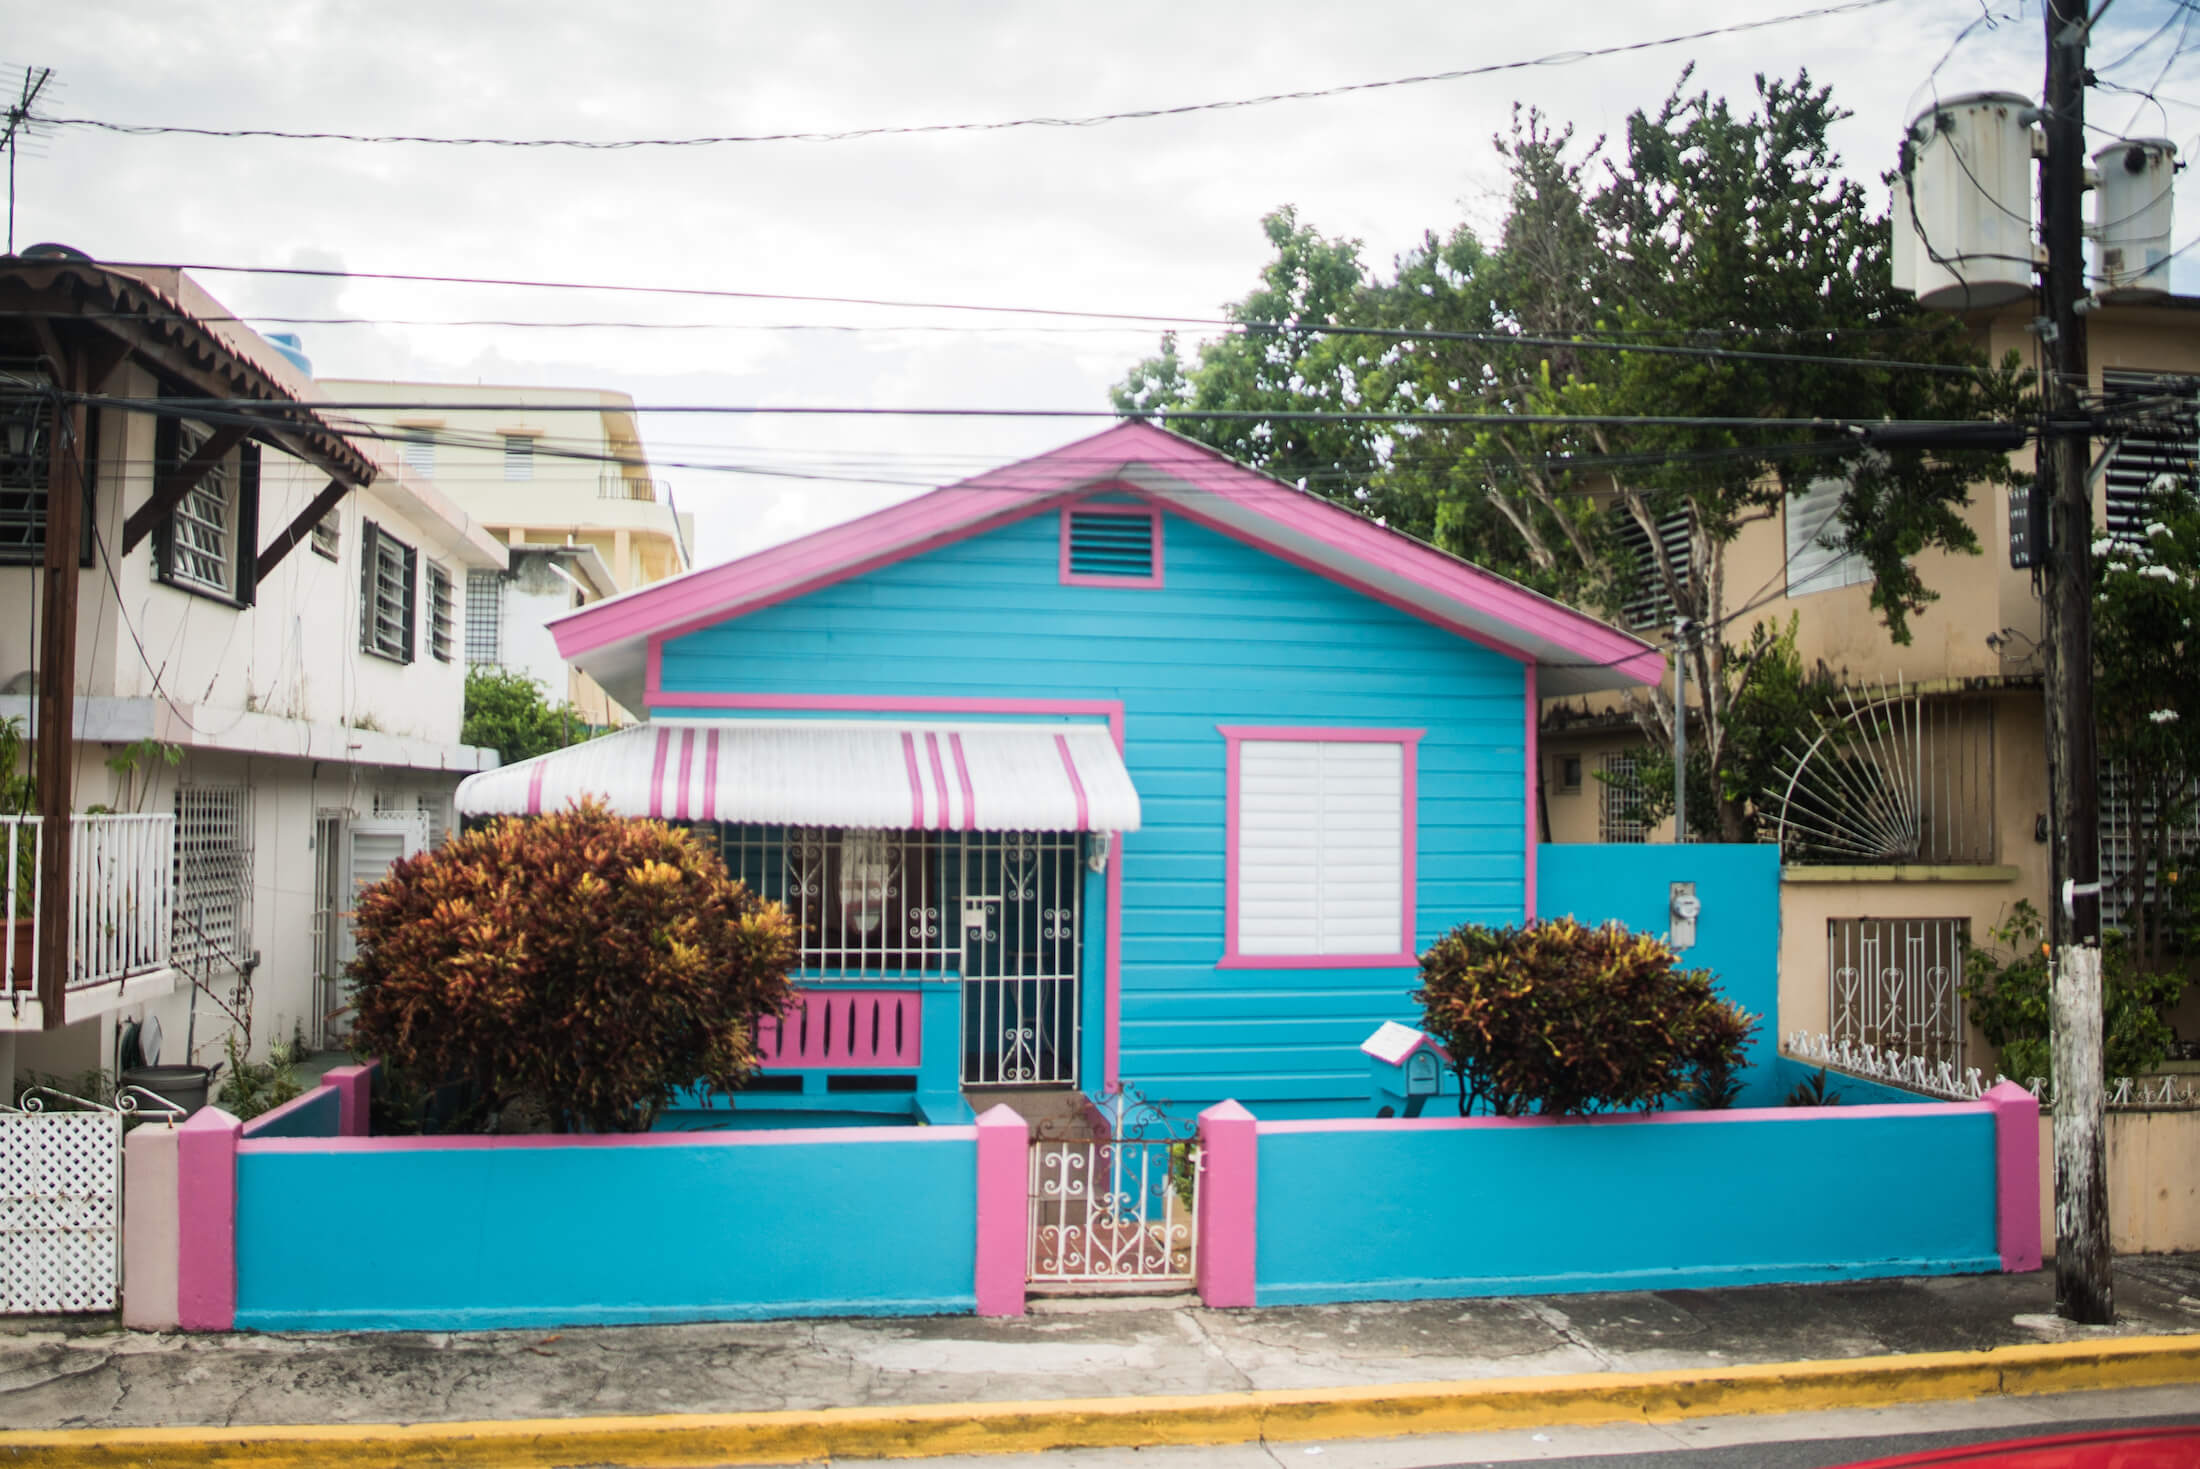 engle-olson-photography-puerto-rico-36.jpg